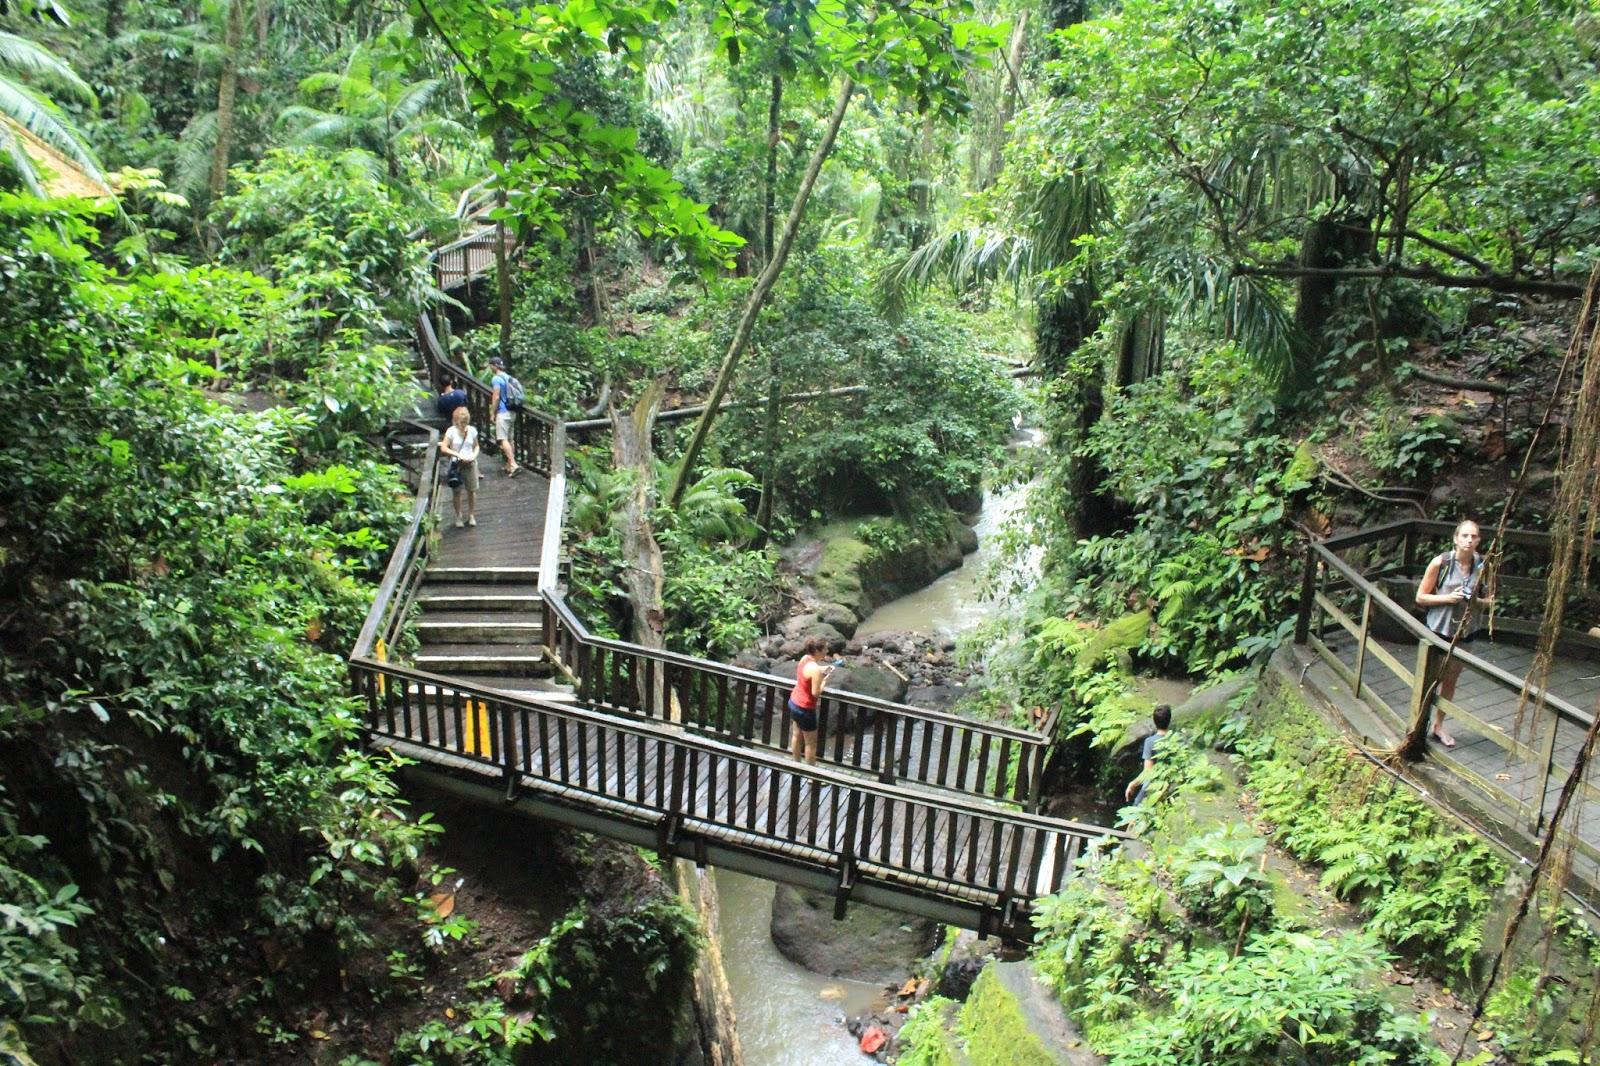 Ubud Monkey Forest Wisata Alam Yang Wajib Dikunjungi